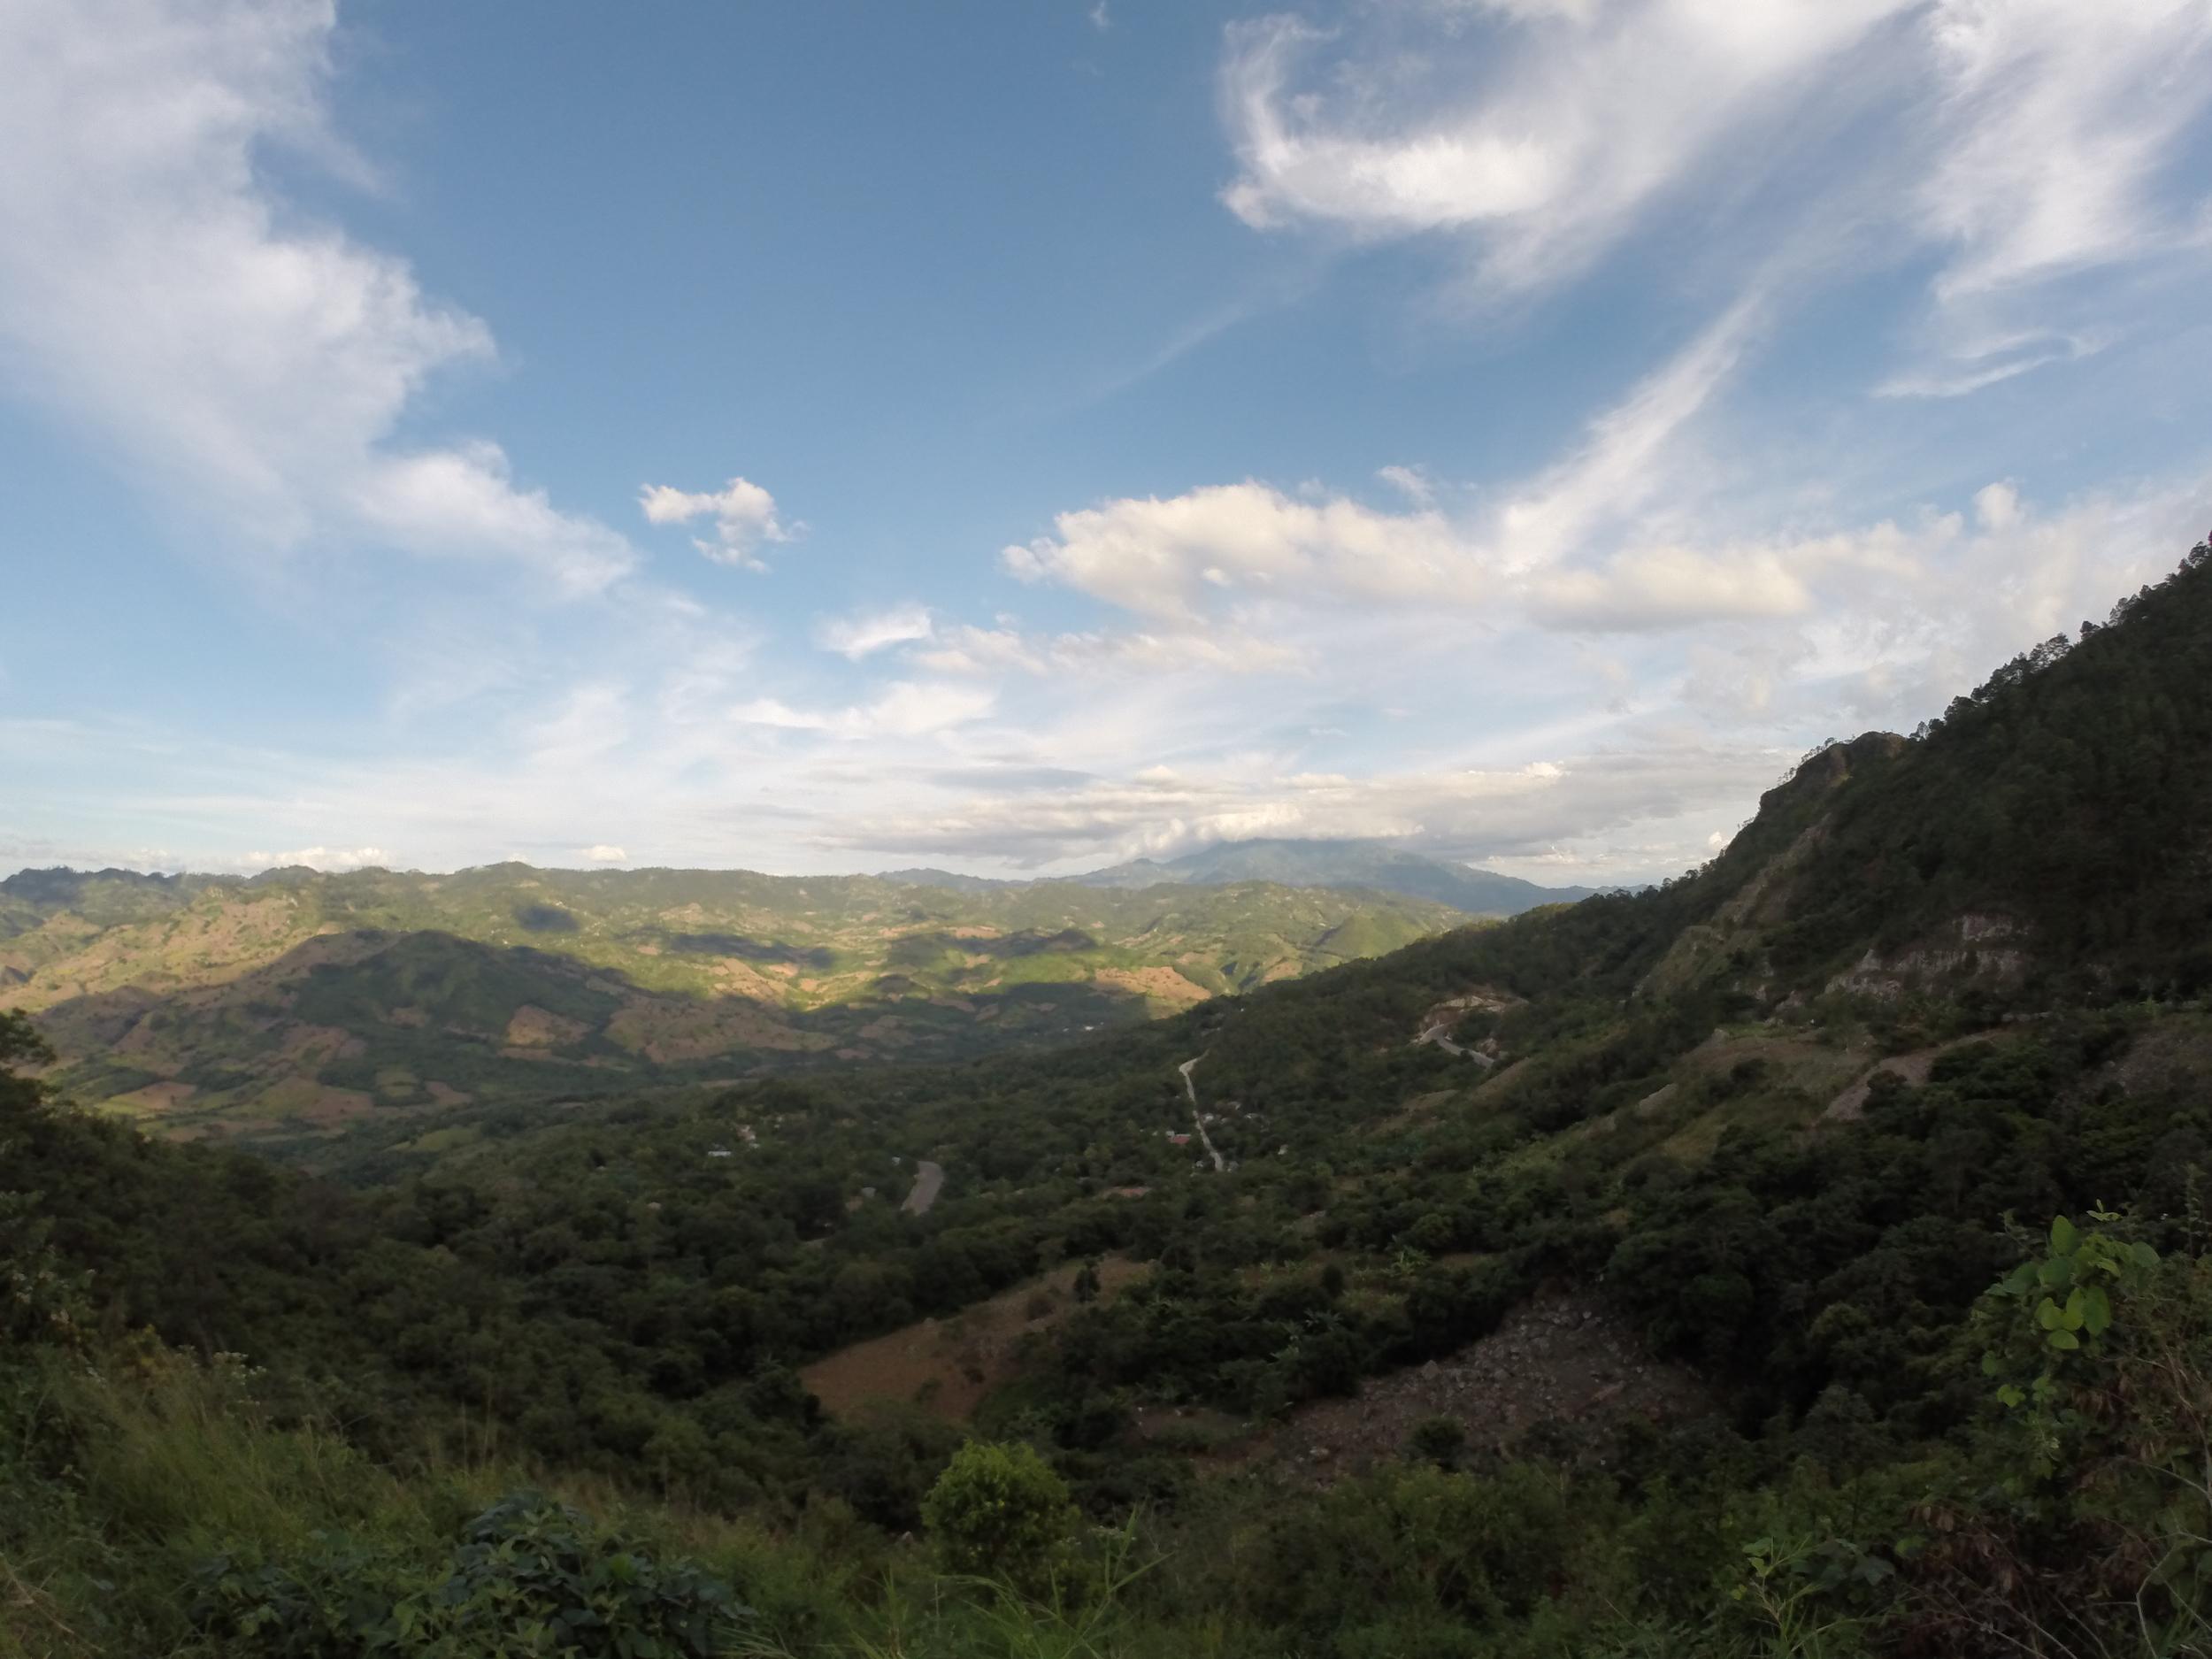 Somewhere in Honduras...